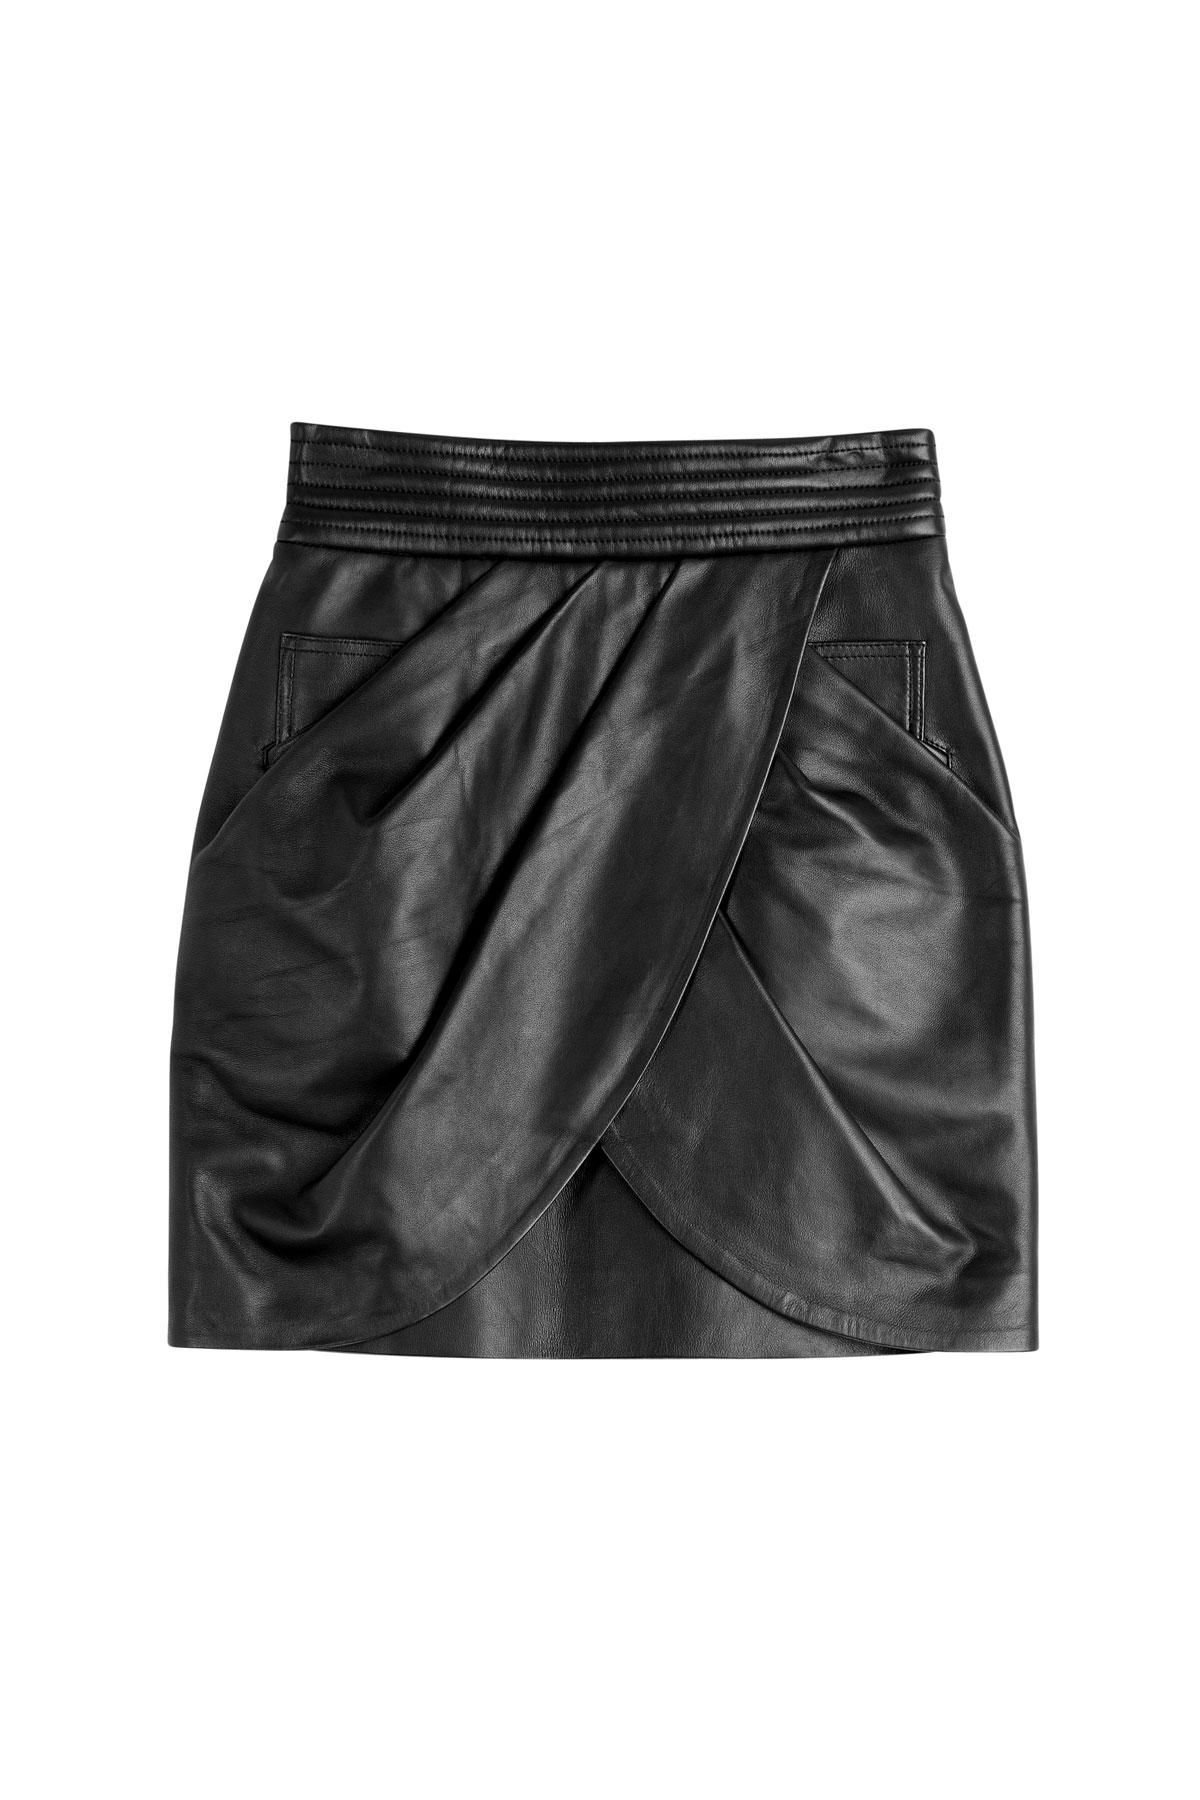 balmain draped leather skirt in black lyst